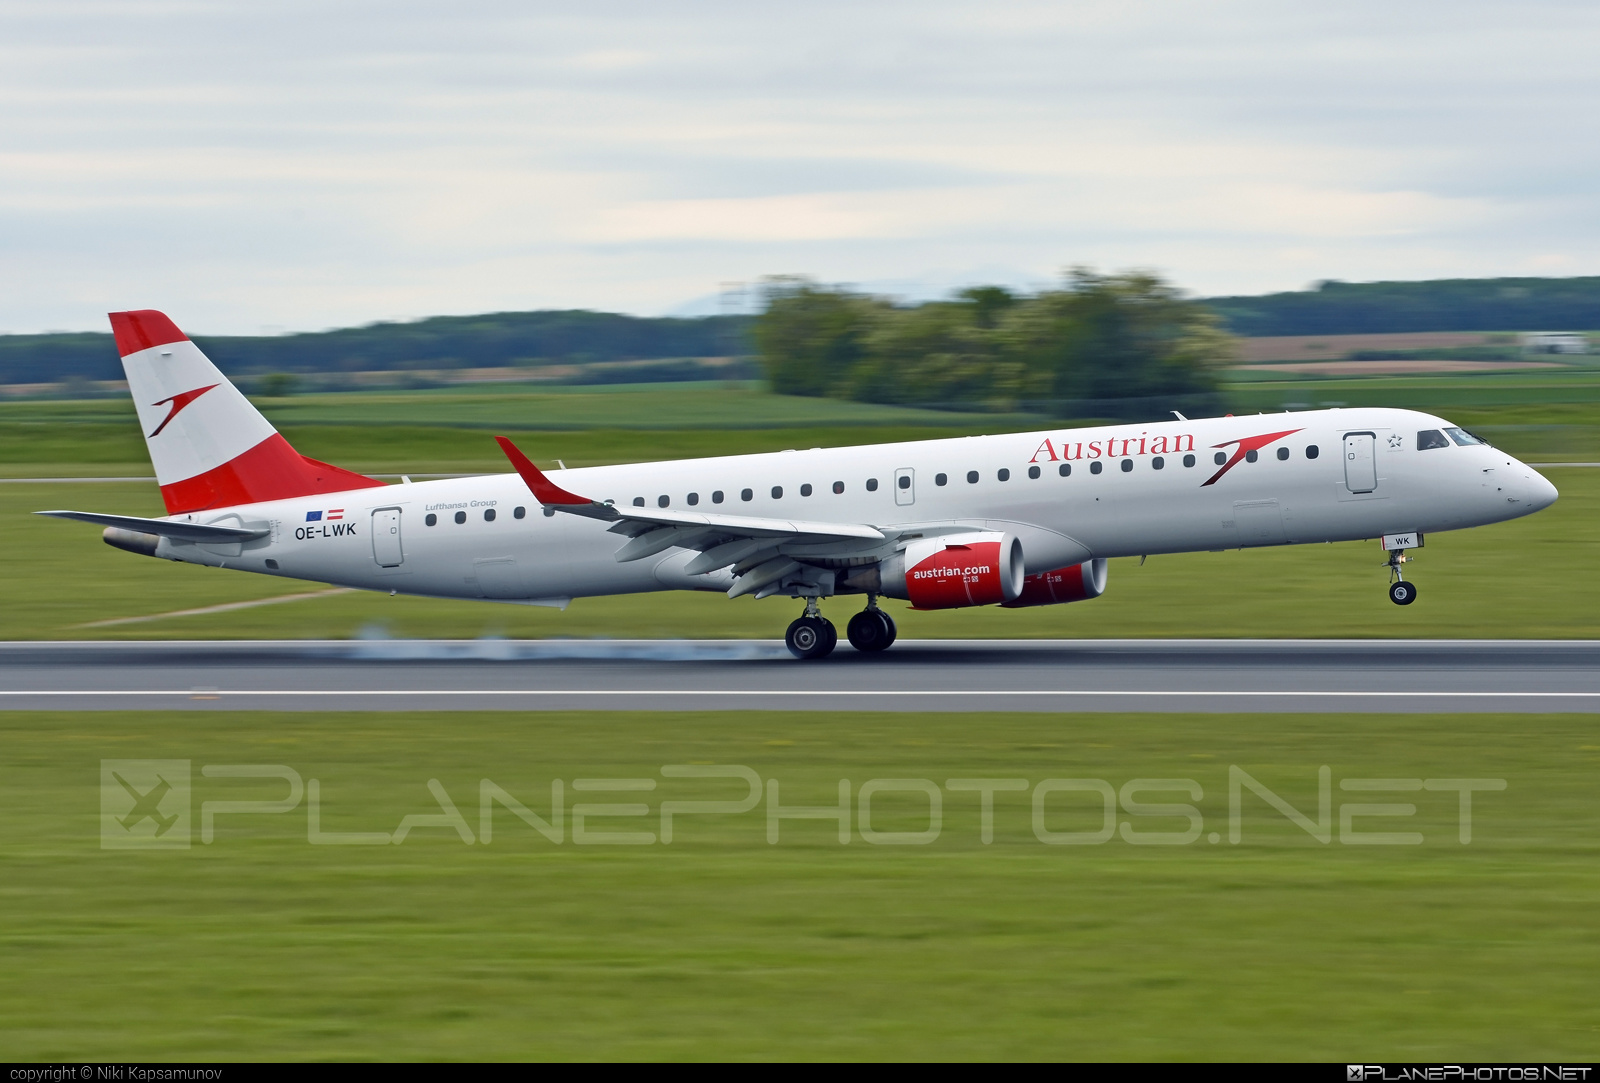 Embraer E195LR (ERJ-190-200LR) - OE-LWK operated by Austrian Airlines #e190 #e190200 #e190200lr #e195lr #embraer #embraer190200lr #embraer195 #embraer195lr